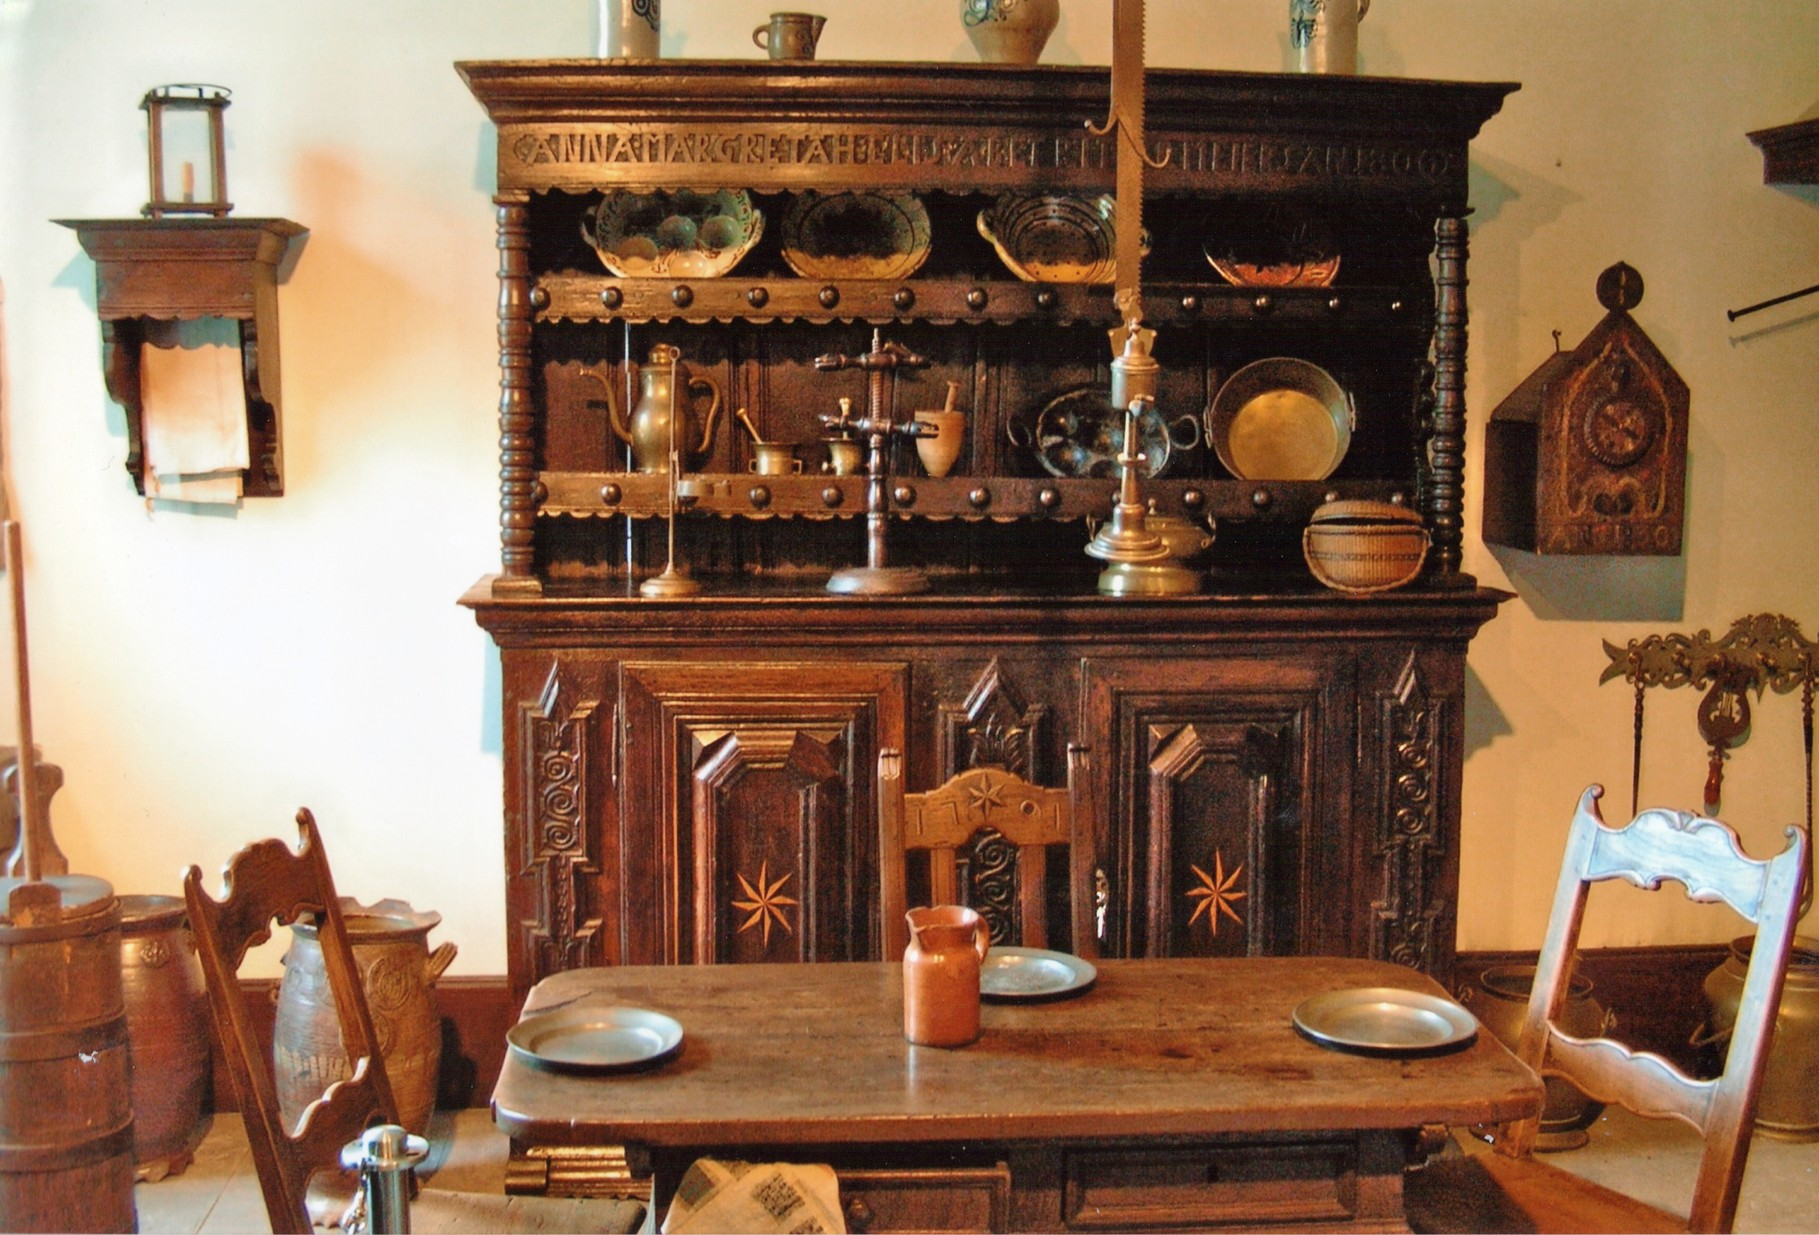 Küche, 18./ früh. 19. Jahrhundert